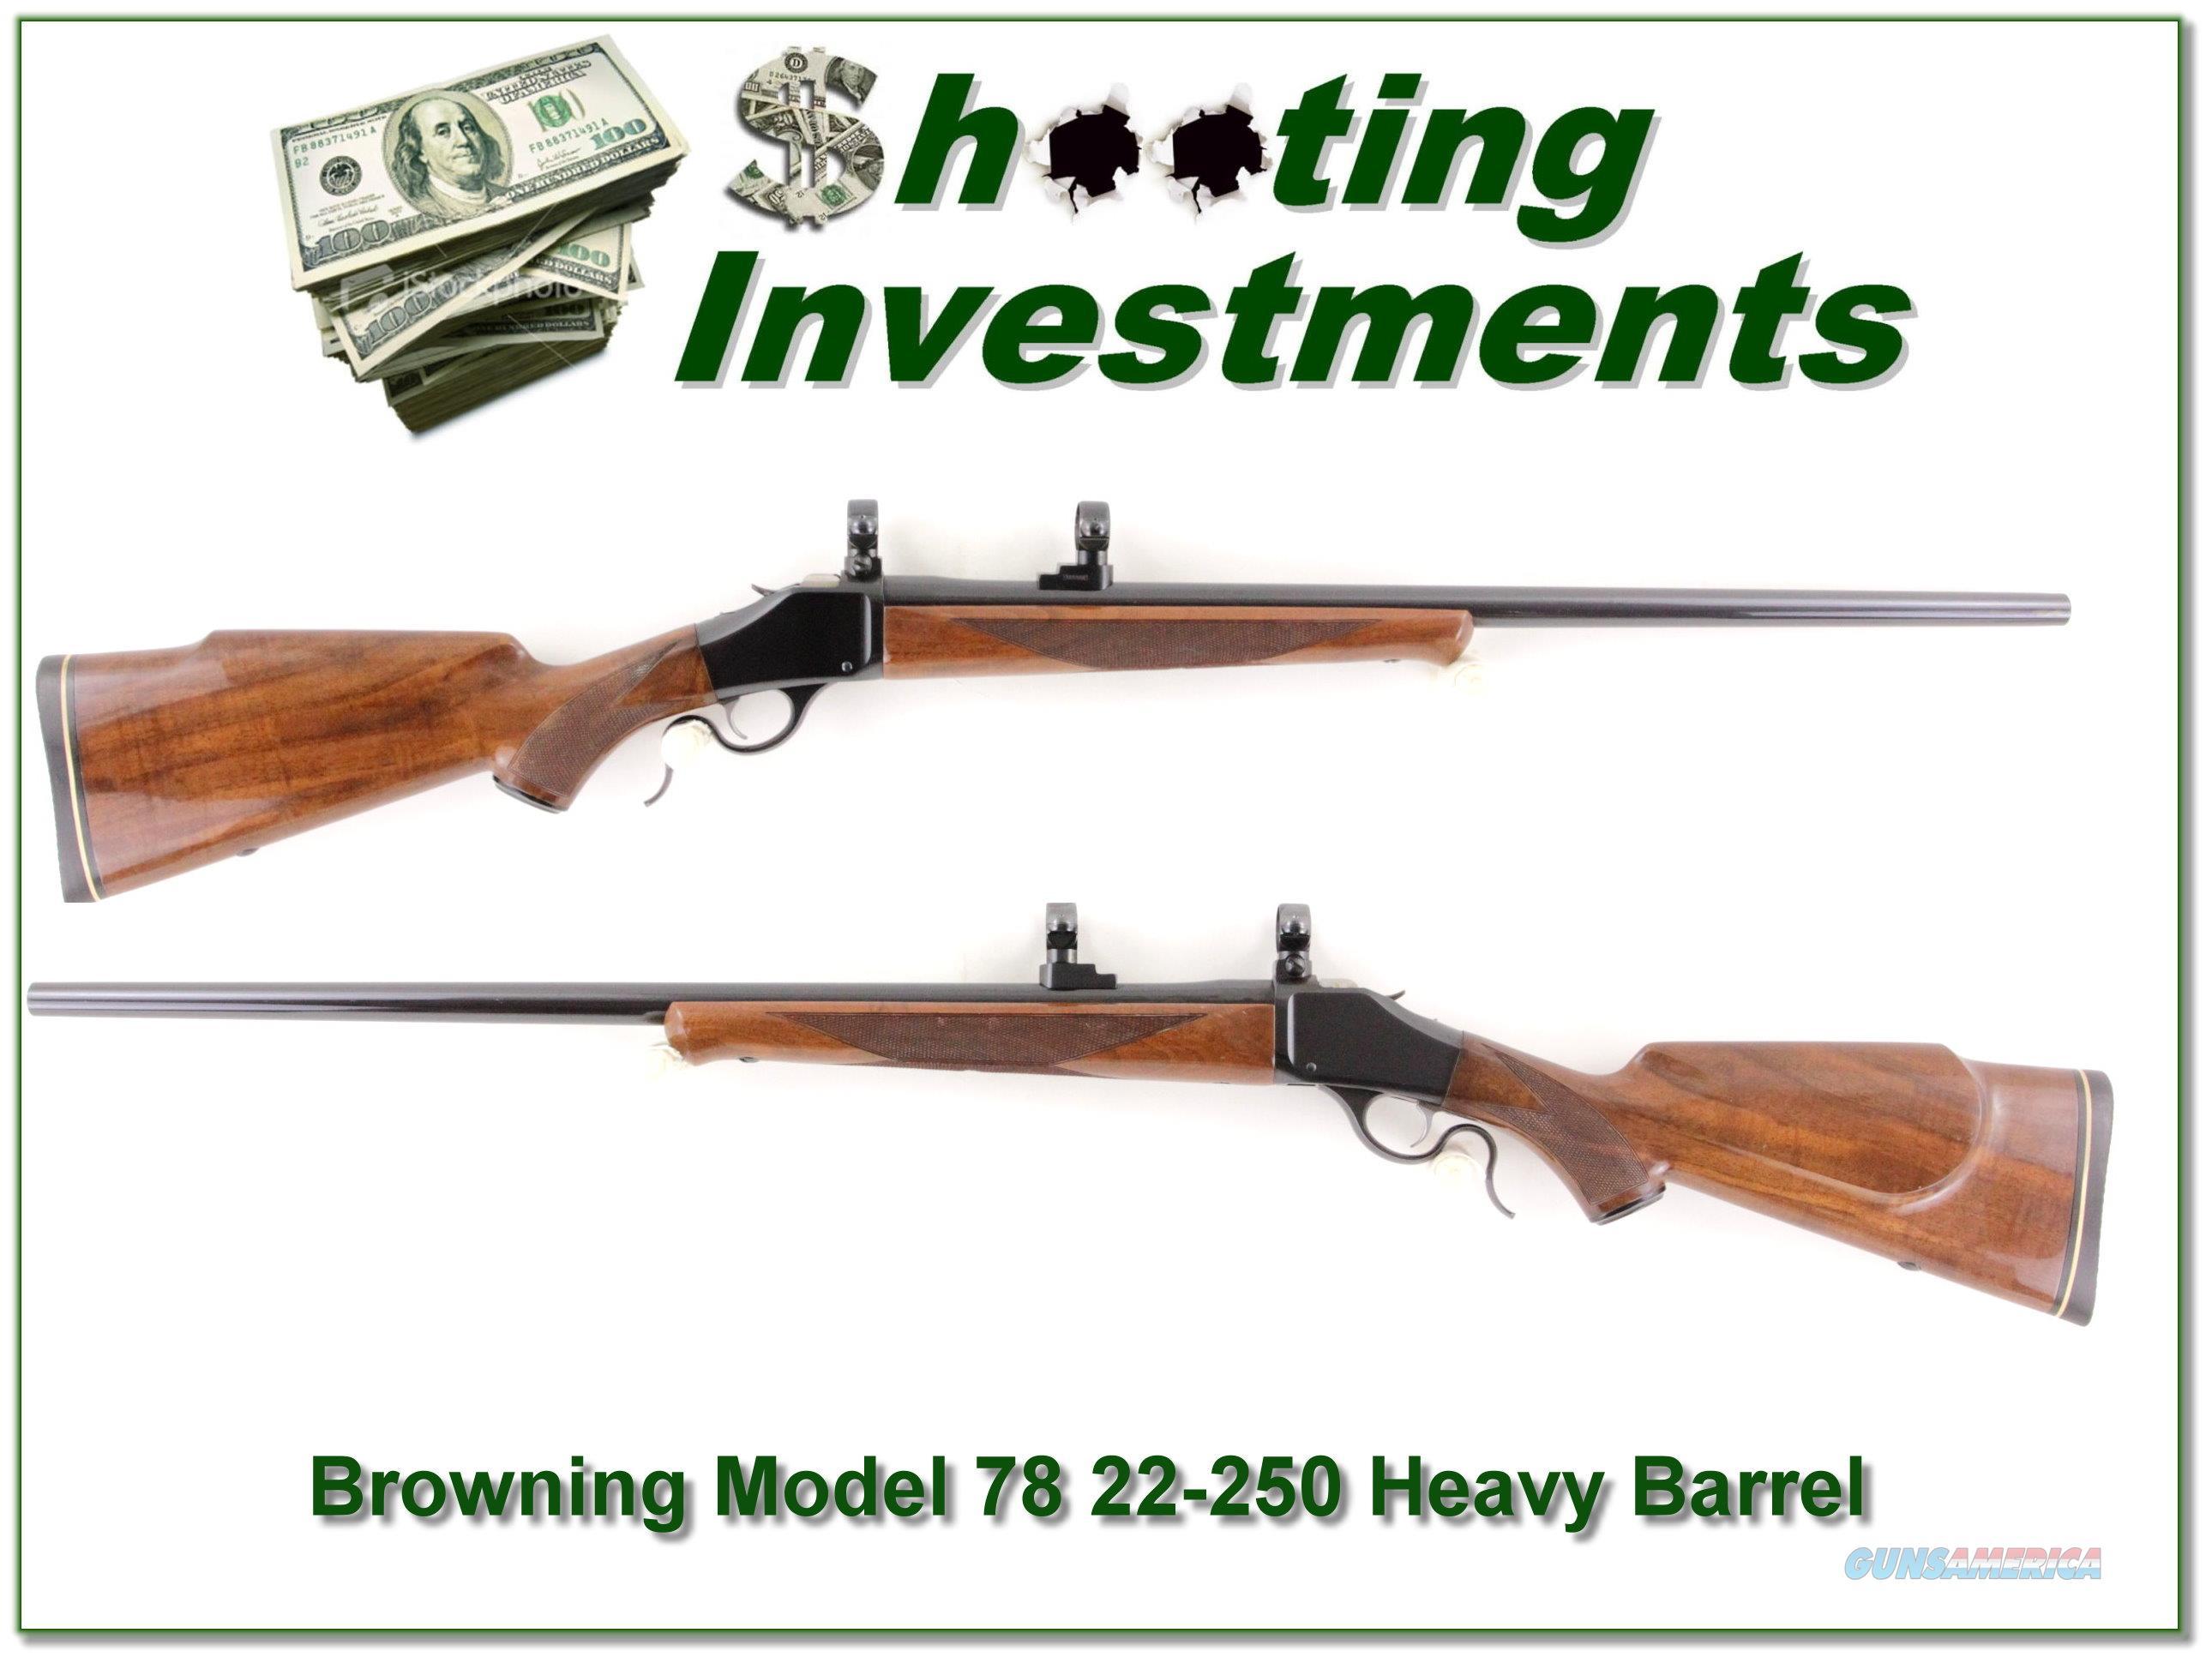 Browning Model 78 Heavy Barrel 22-250  Guns > Rifles > Browning Rifles > Semi Auto > Hunting